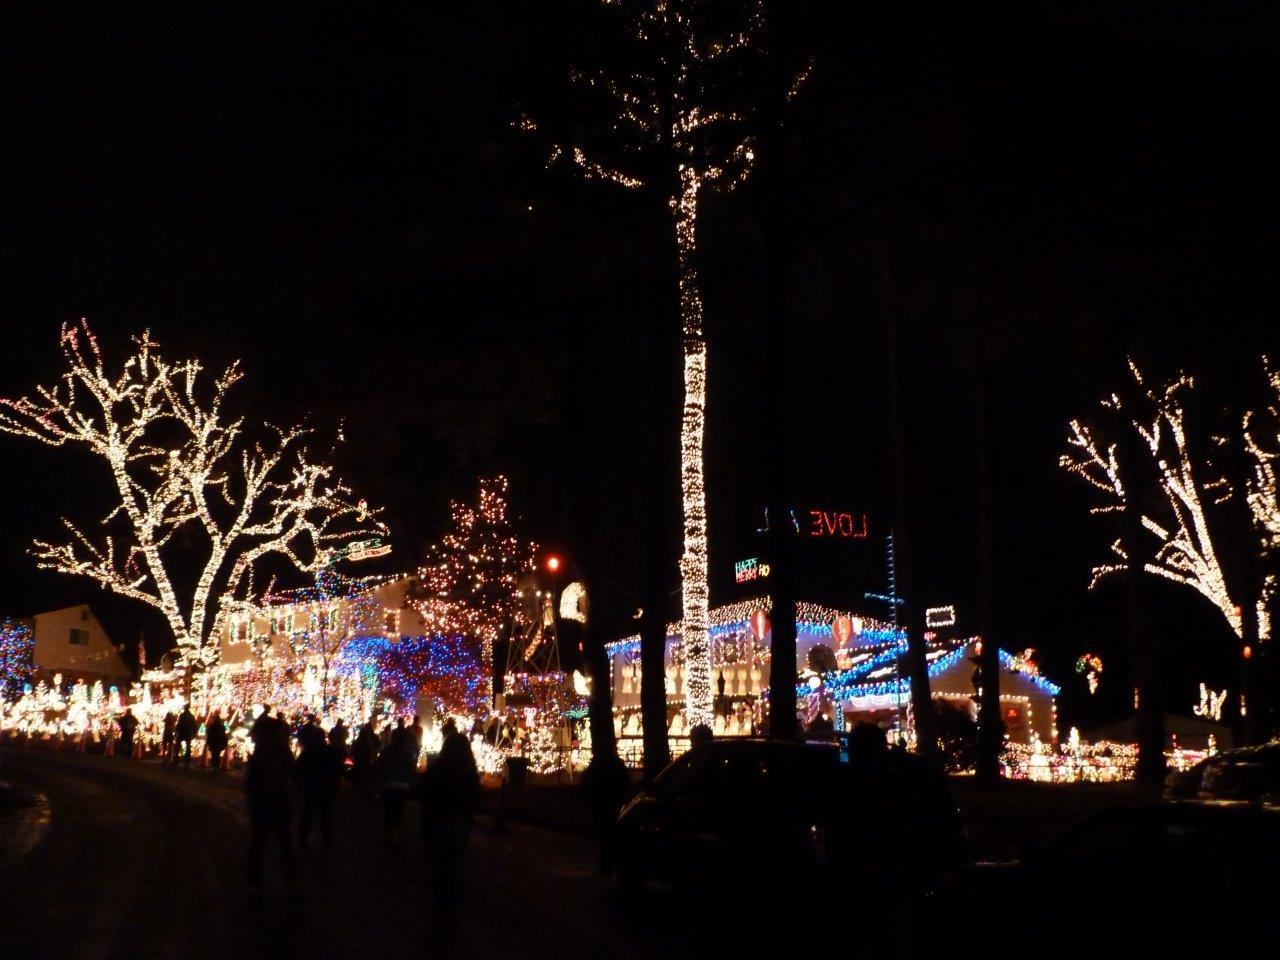 Blog - Friday Faves - Tacky Light Christmas Tour